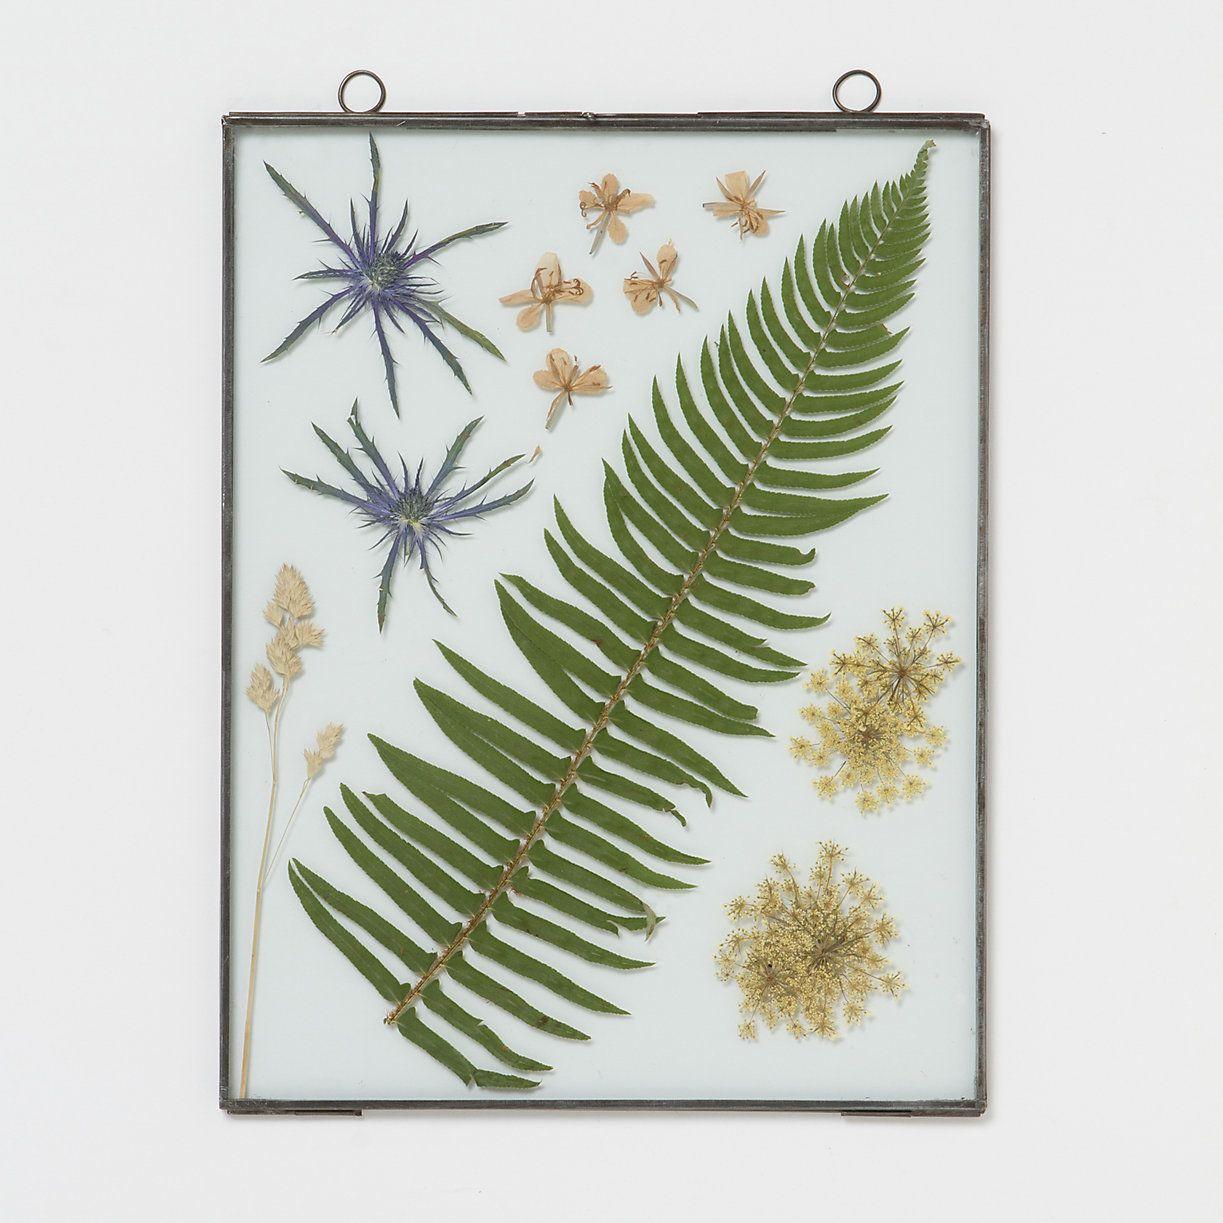 Terrain Home Decor: Botanical Frame, Large Rectangle In House+Home HOME DÉCOR